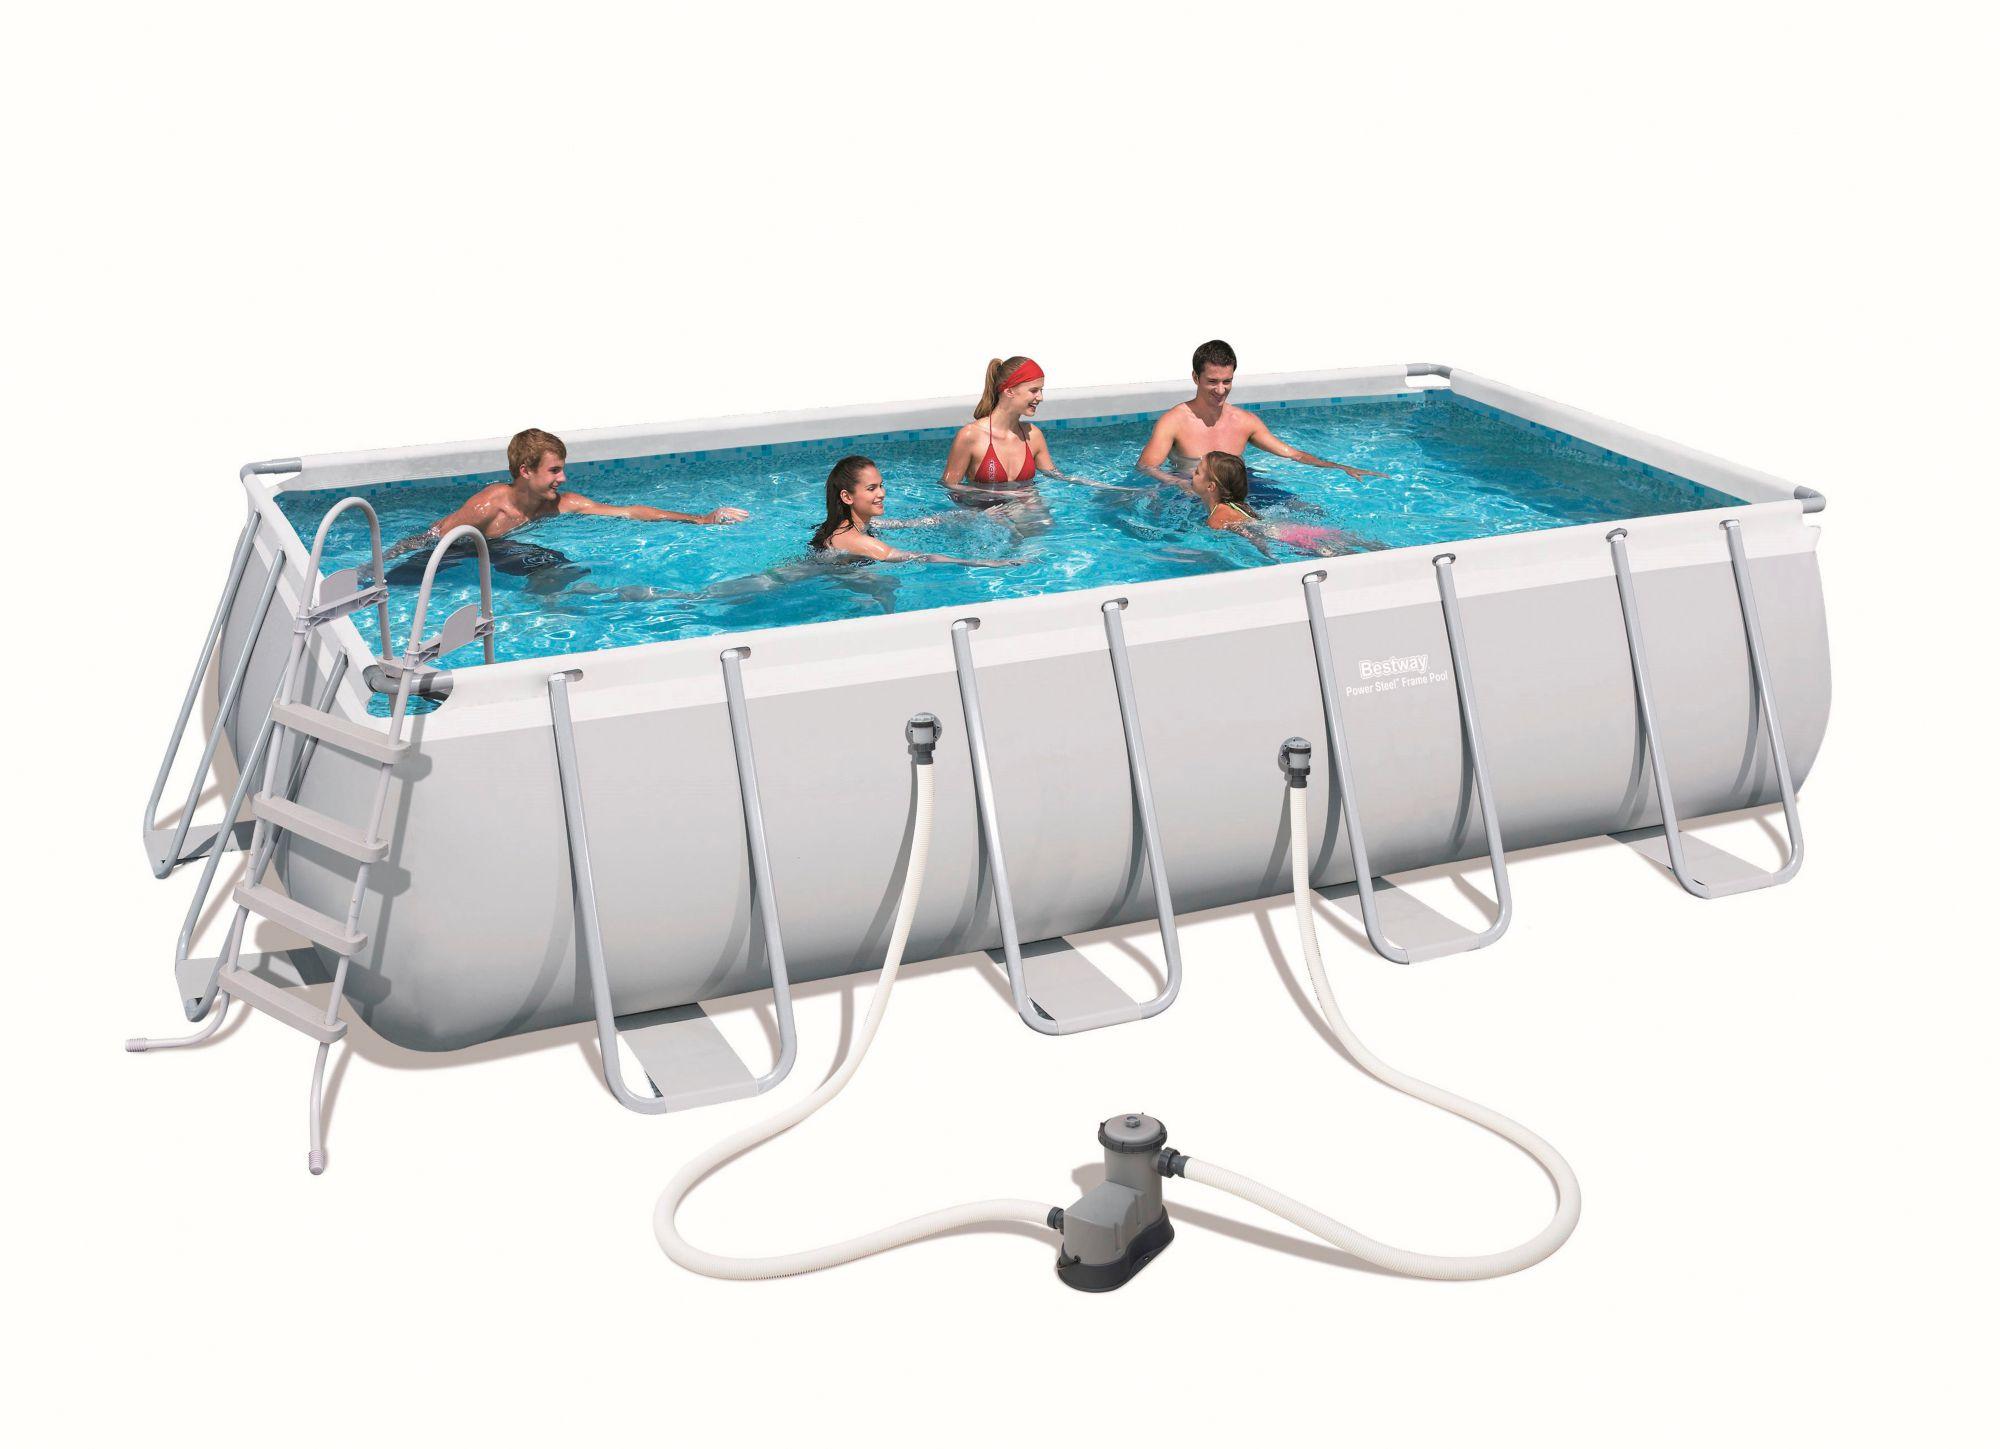 set frame pool power steel 549x274x122 cm rechteckig mit filterpumpe zubeh r schwab. Black Bedroom Furniture Sets. Home Design Ideas